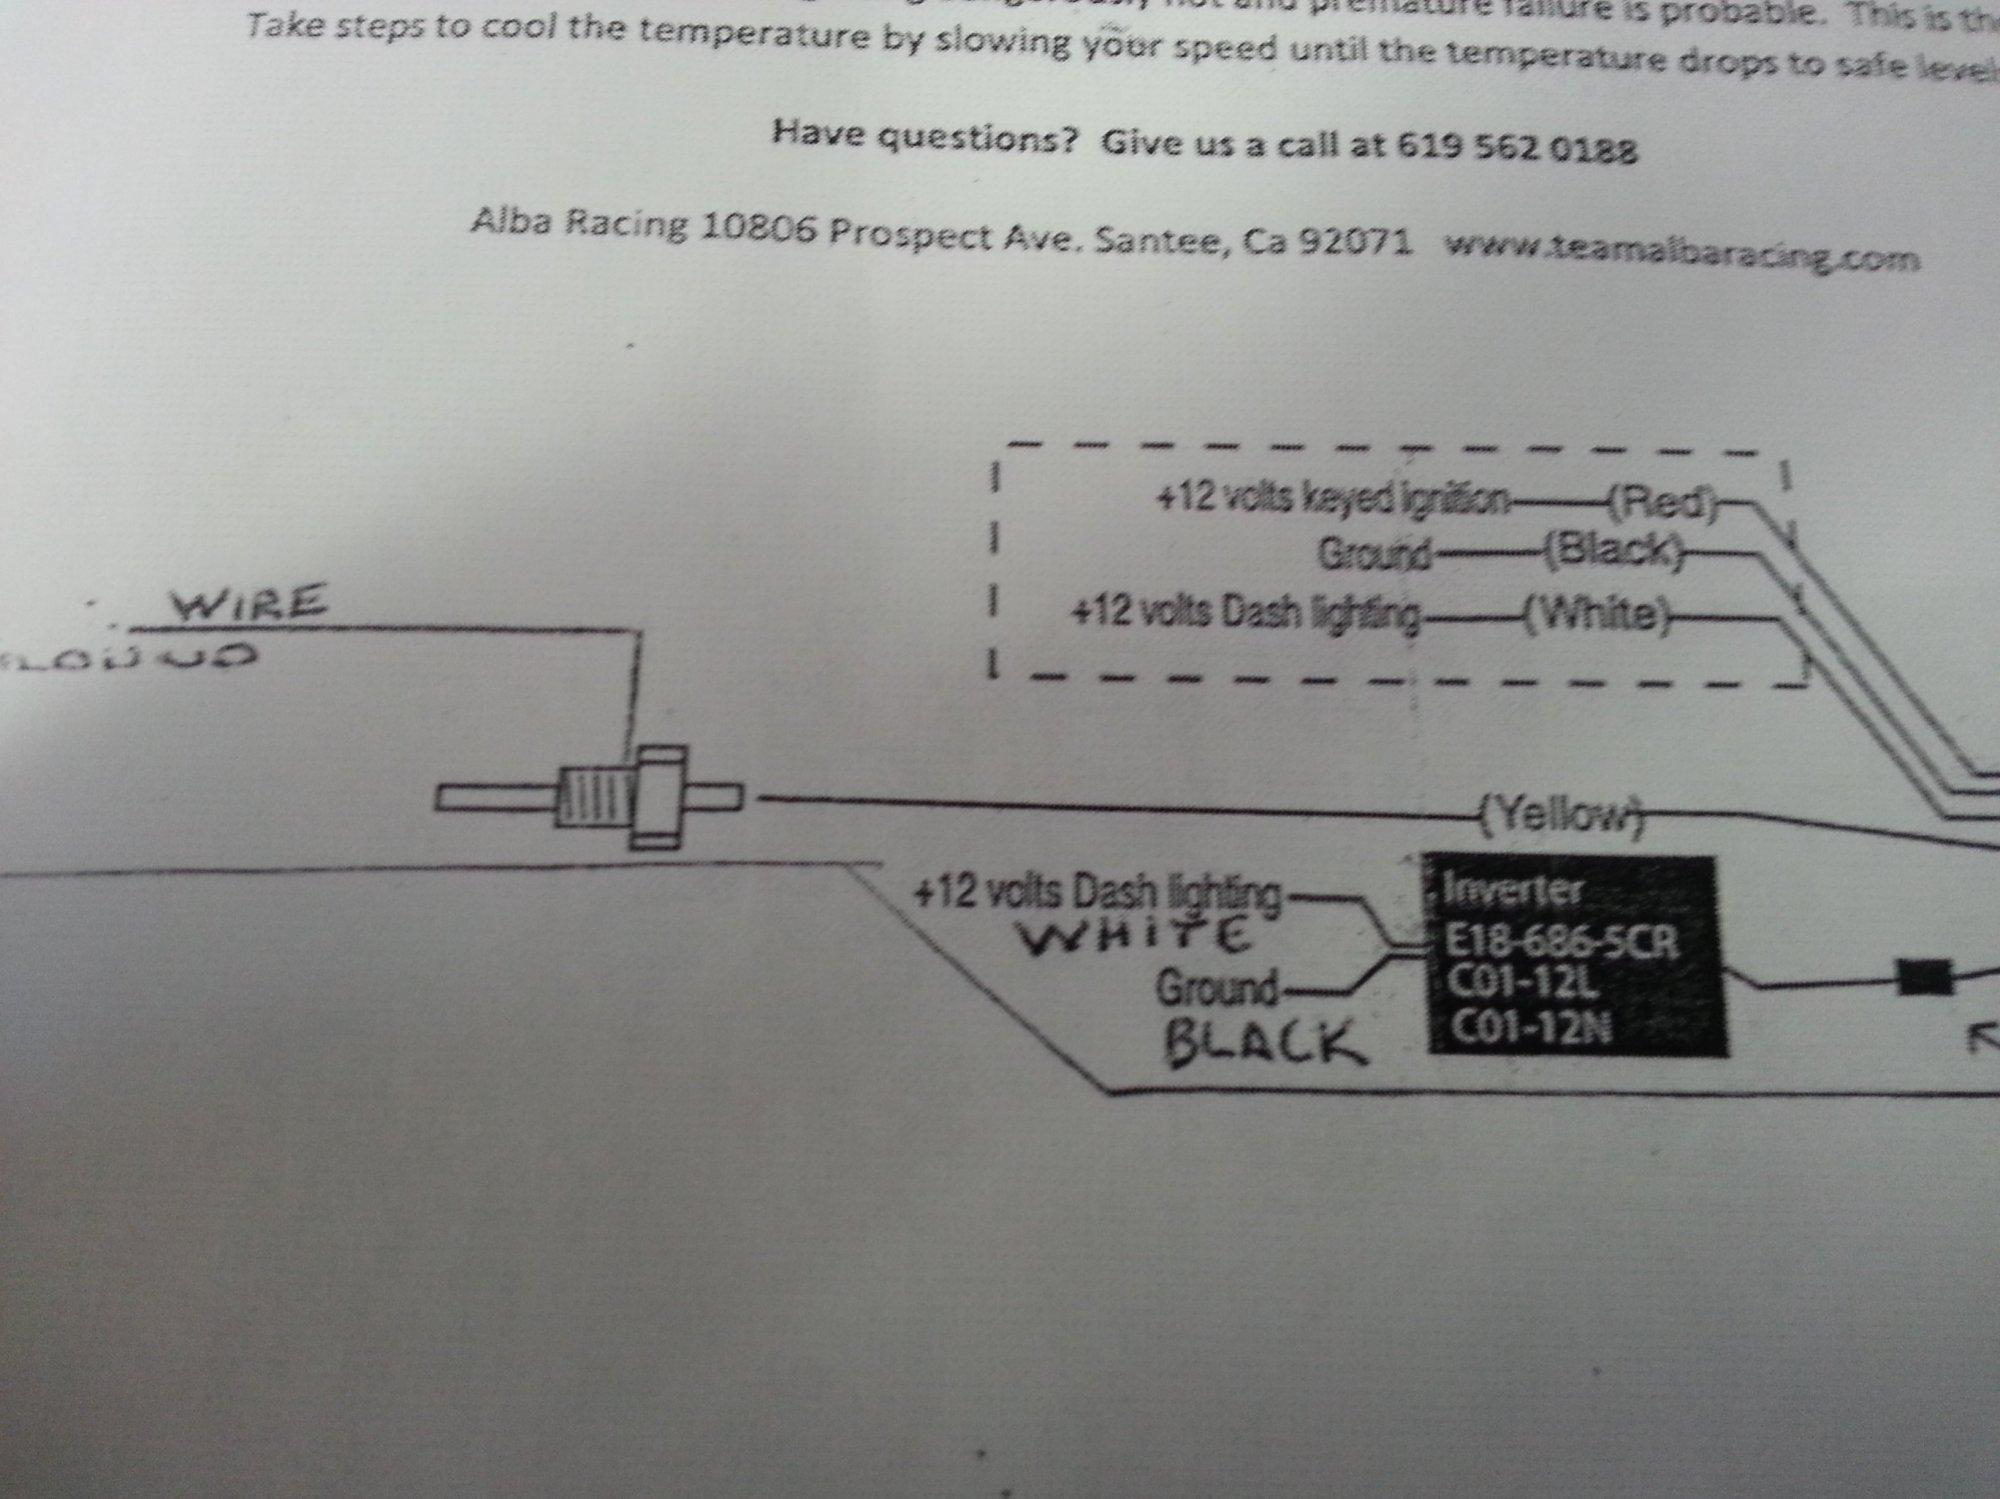 hight resolution of  3709d1375805209 alba racing belt temp gauge 20130806 090420 alba racing belt temp gauge attachments dragon boost dragon boost gauge wiring diagram